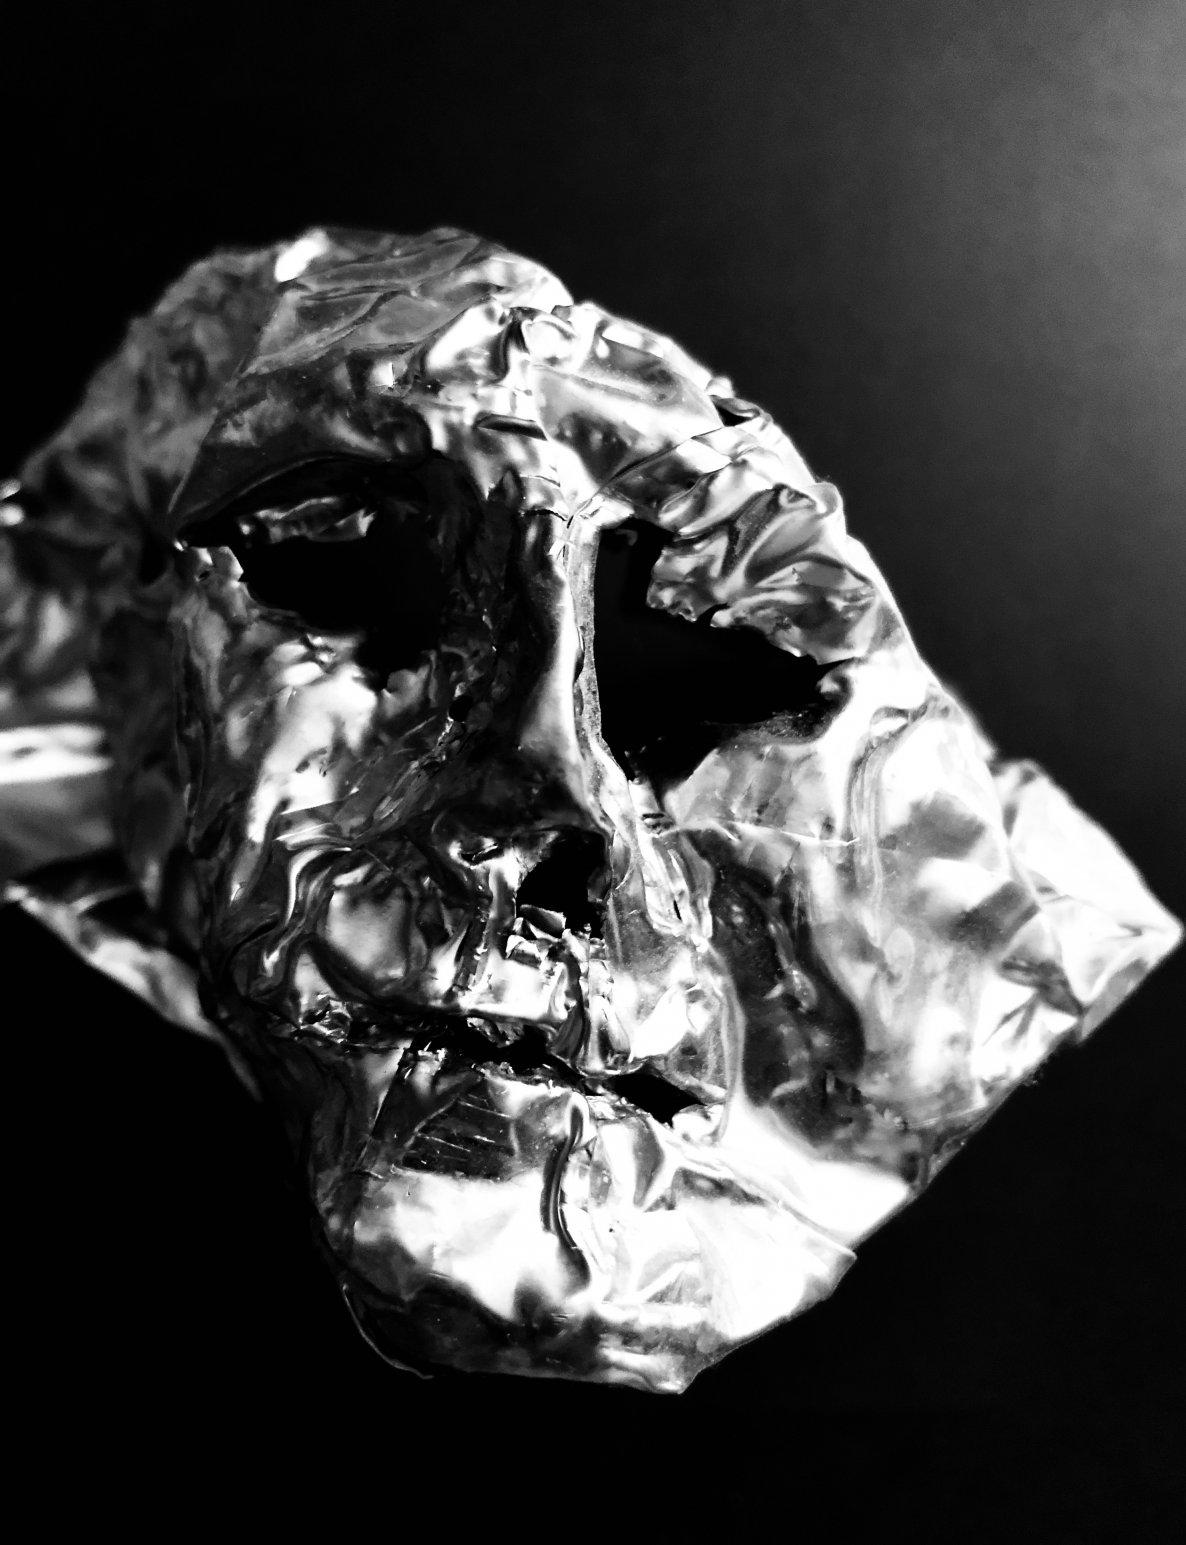 Mask III (2018) - Guillermo Fernández-Díez Bannatyne